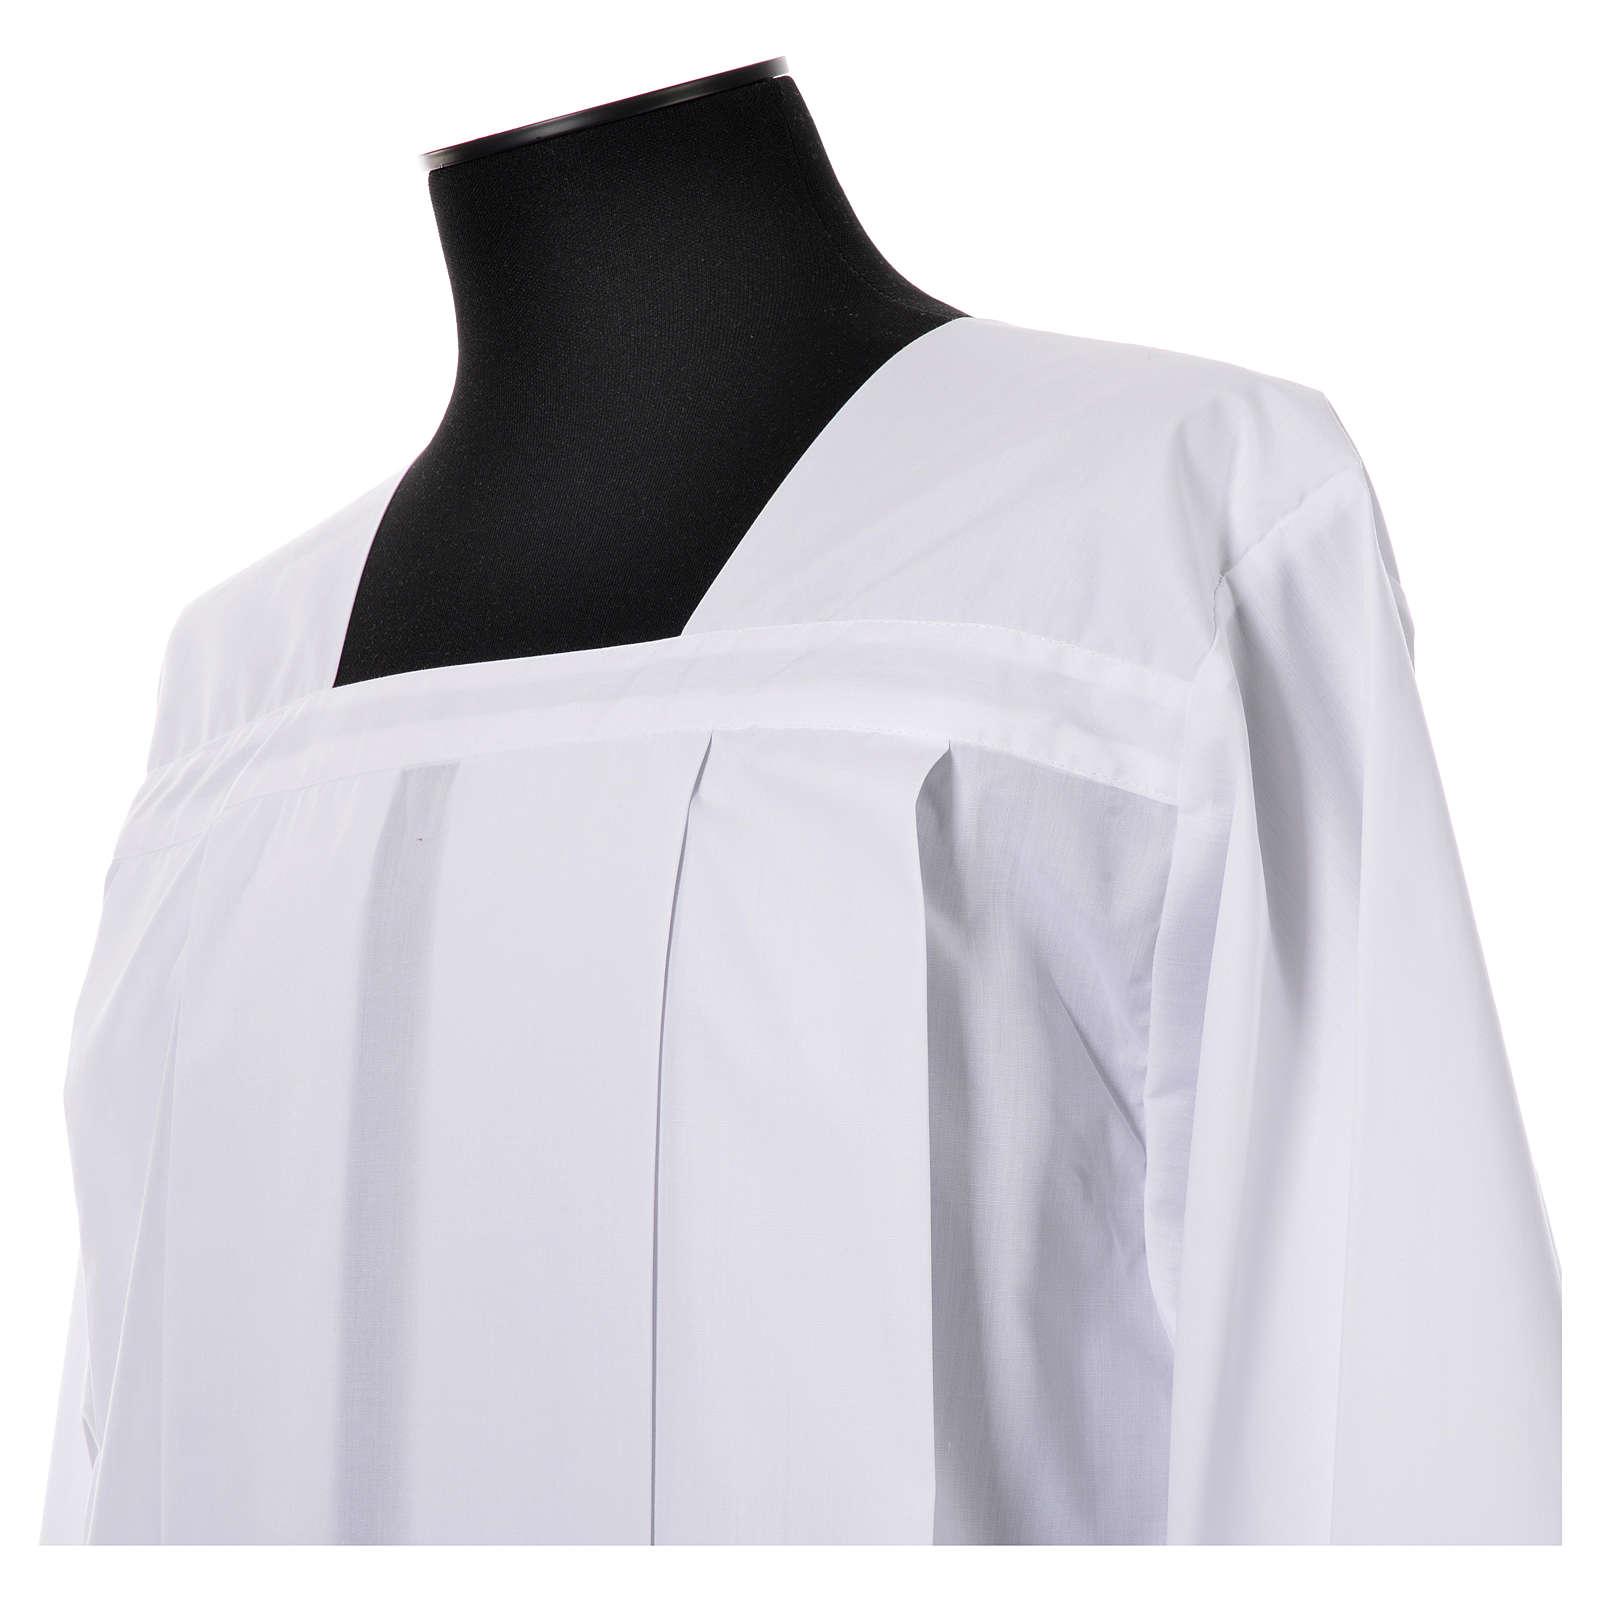 White Surplice 100% polyester lace partition 4 pleats 4